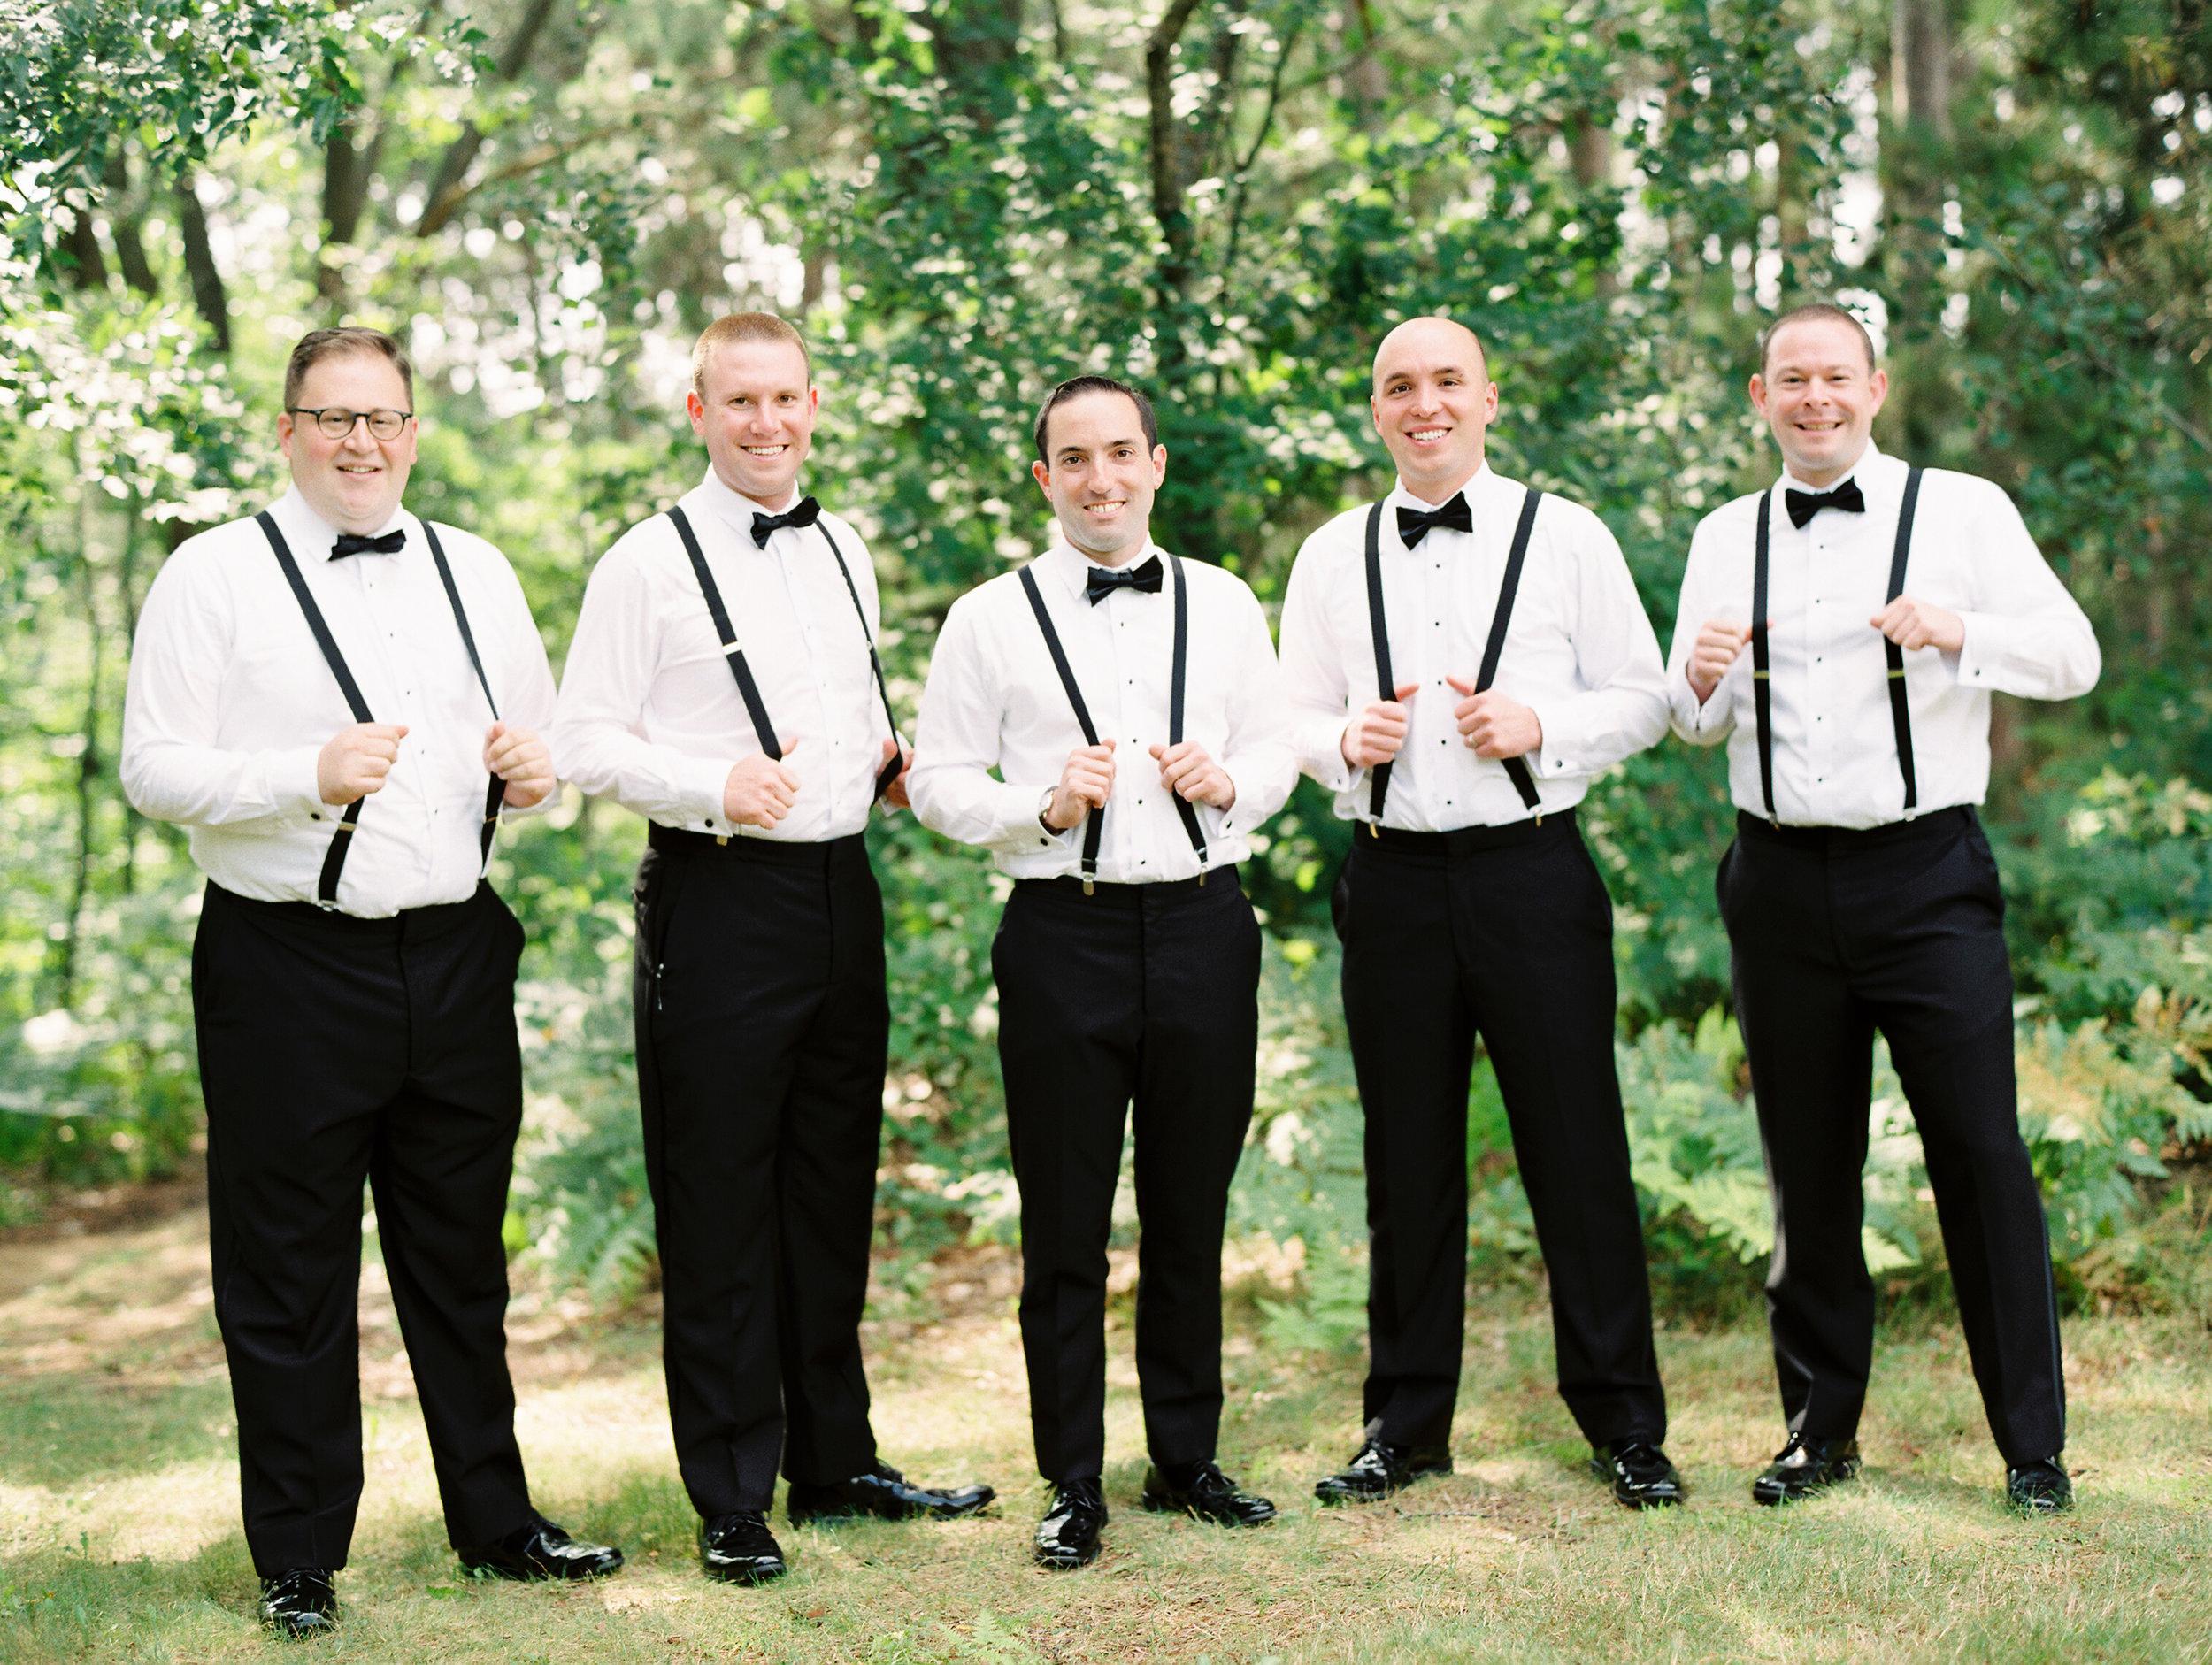 Zoller+Wedding+Bridal+Partyf-60.jpg